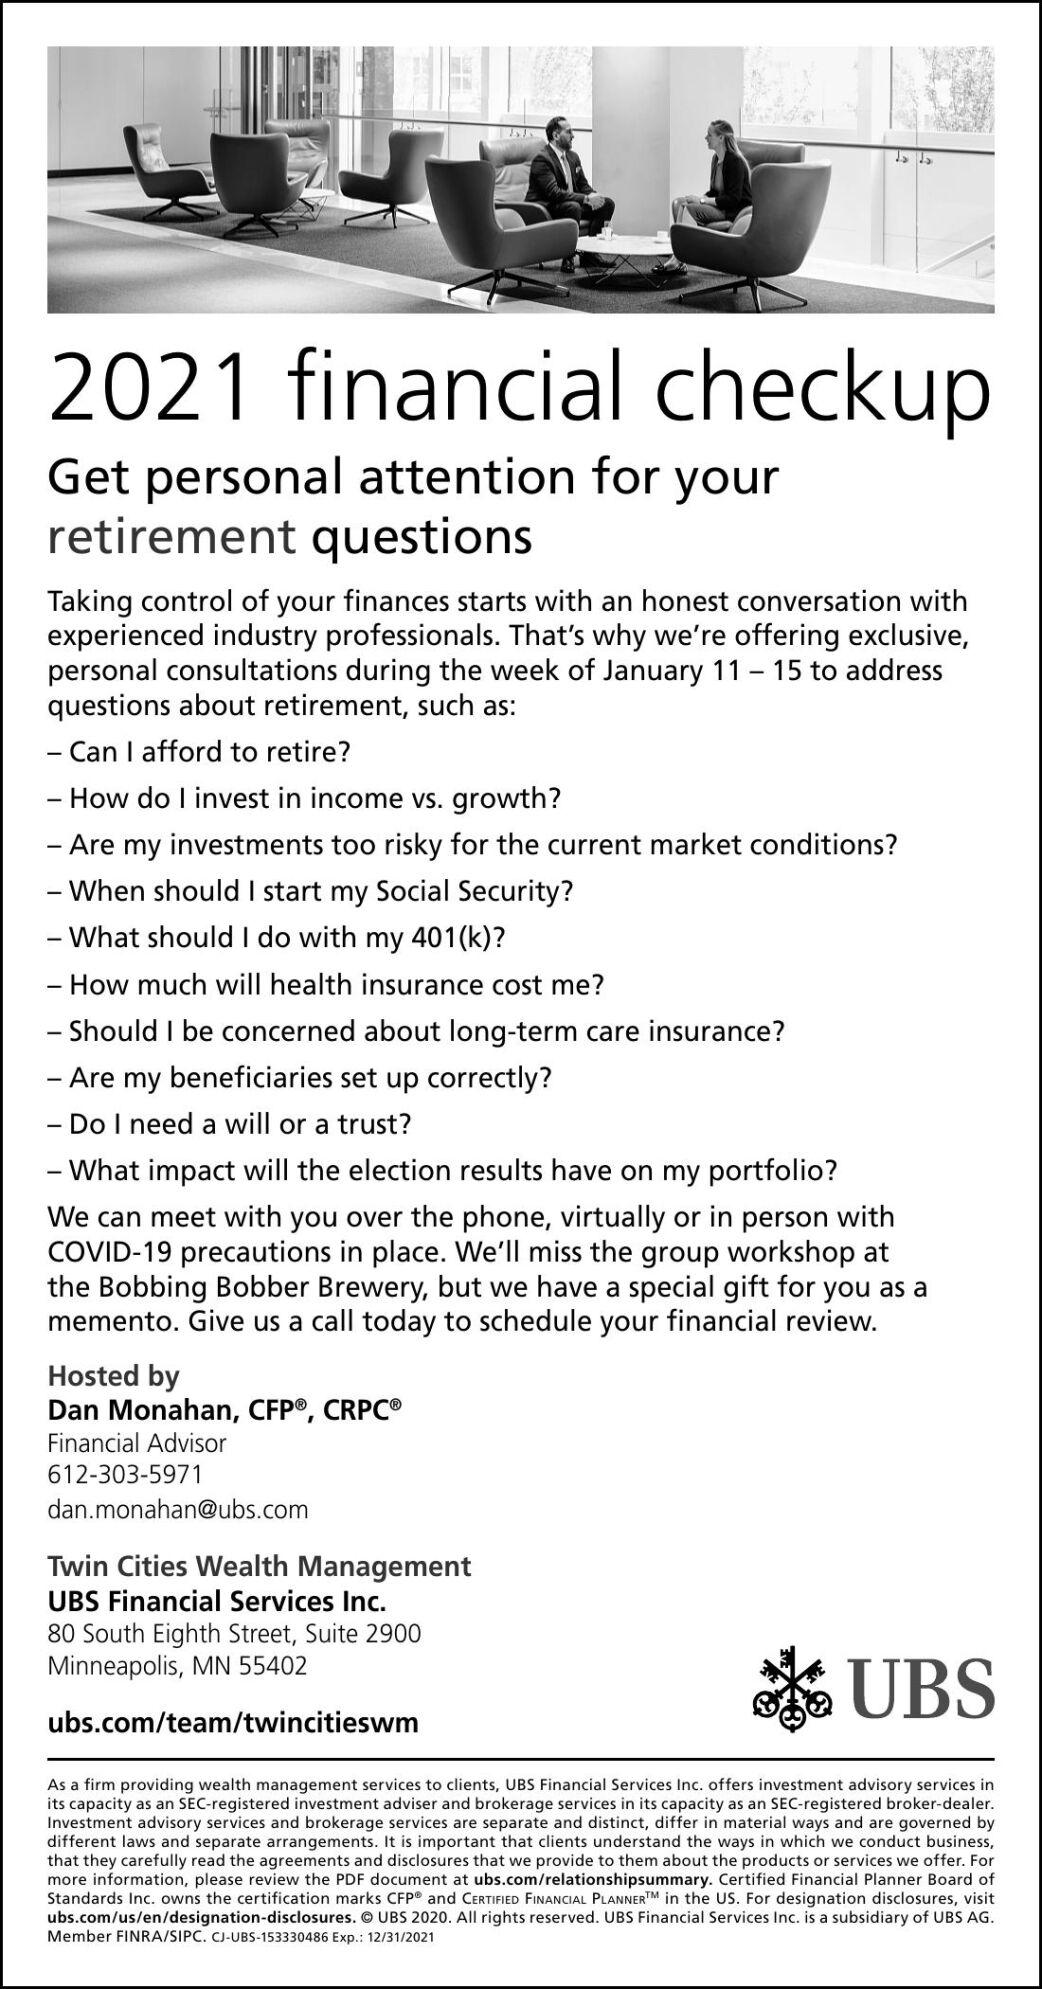 2021 financial checkup Get personal